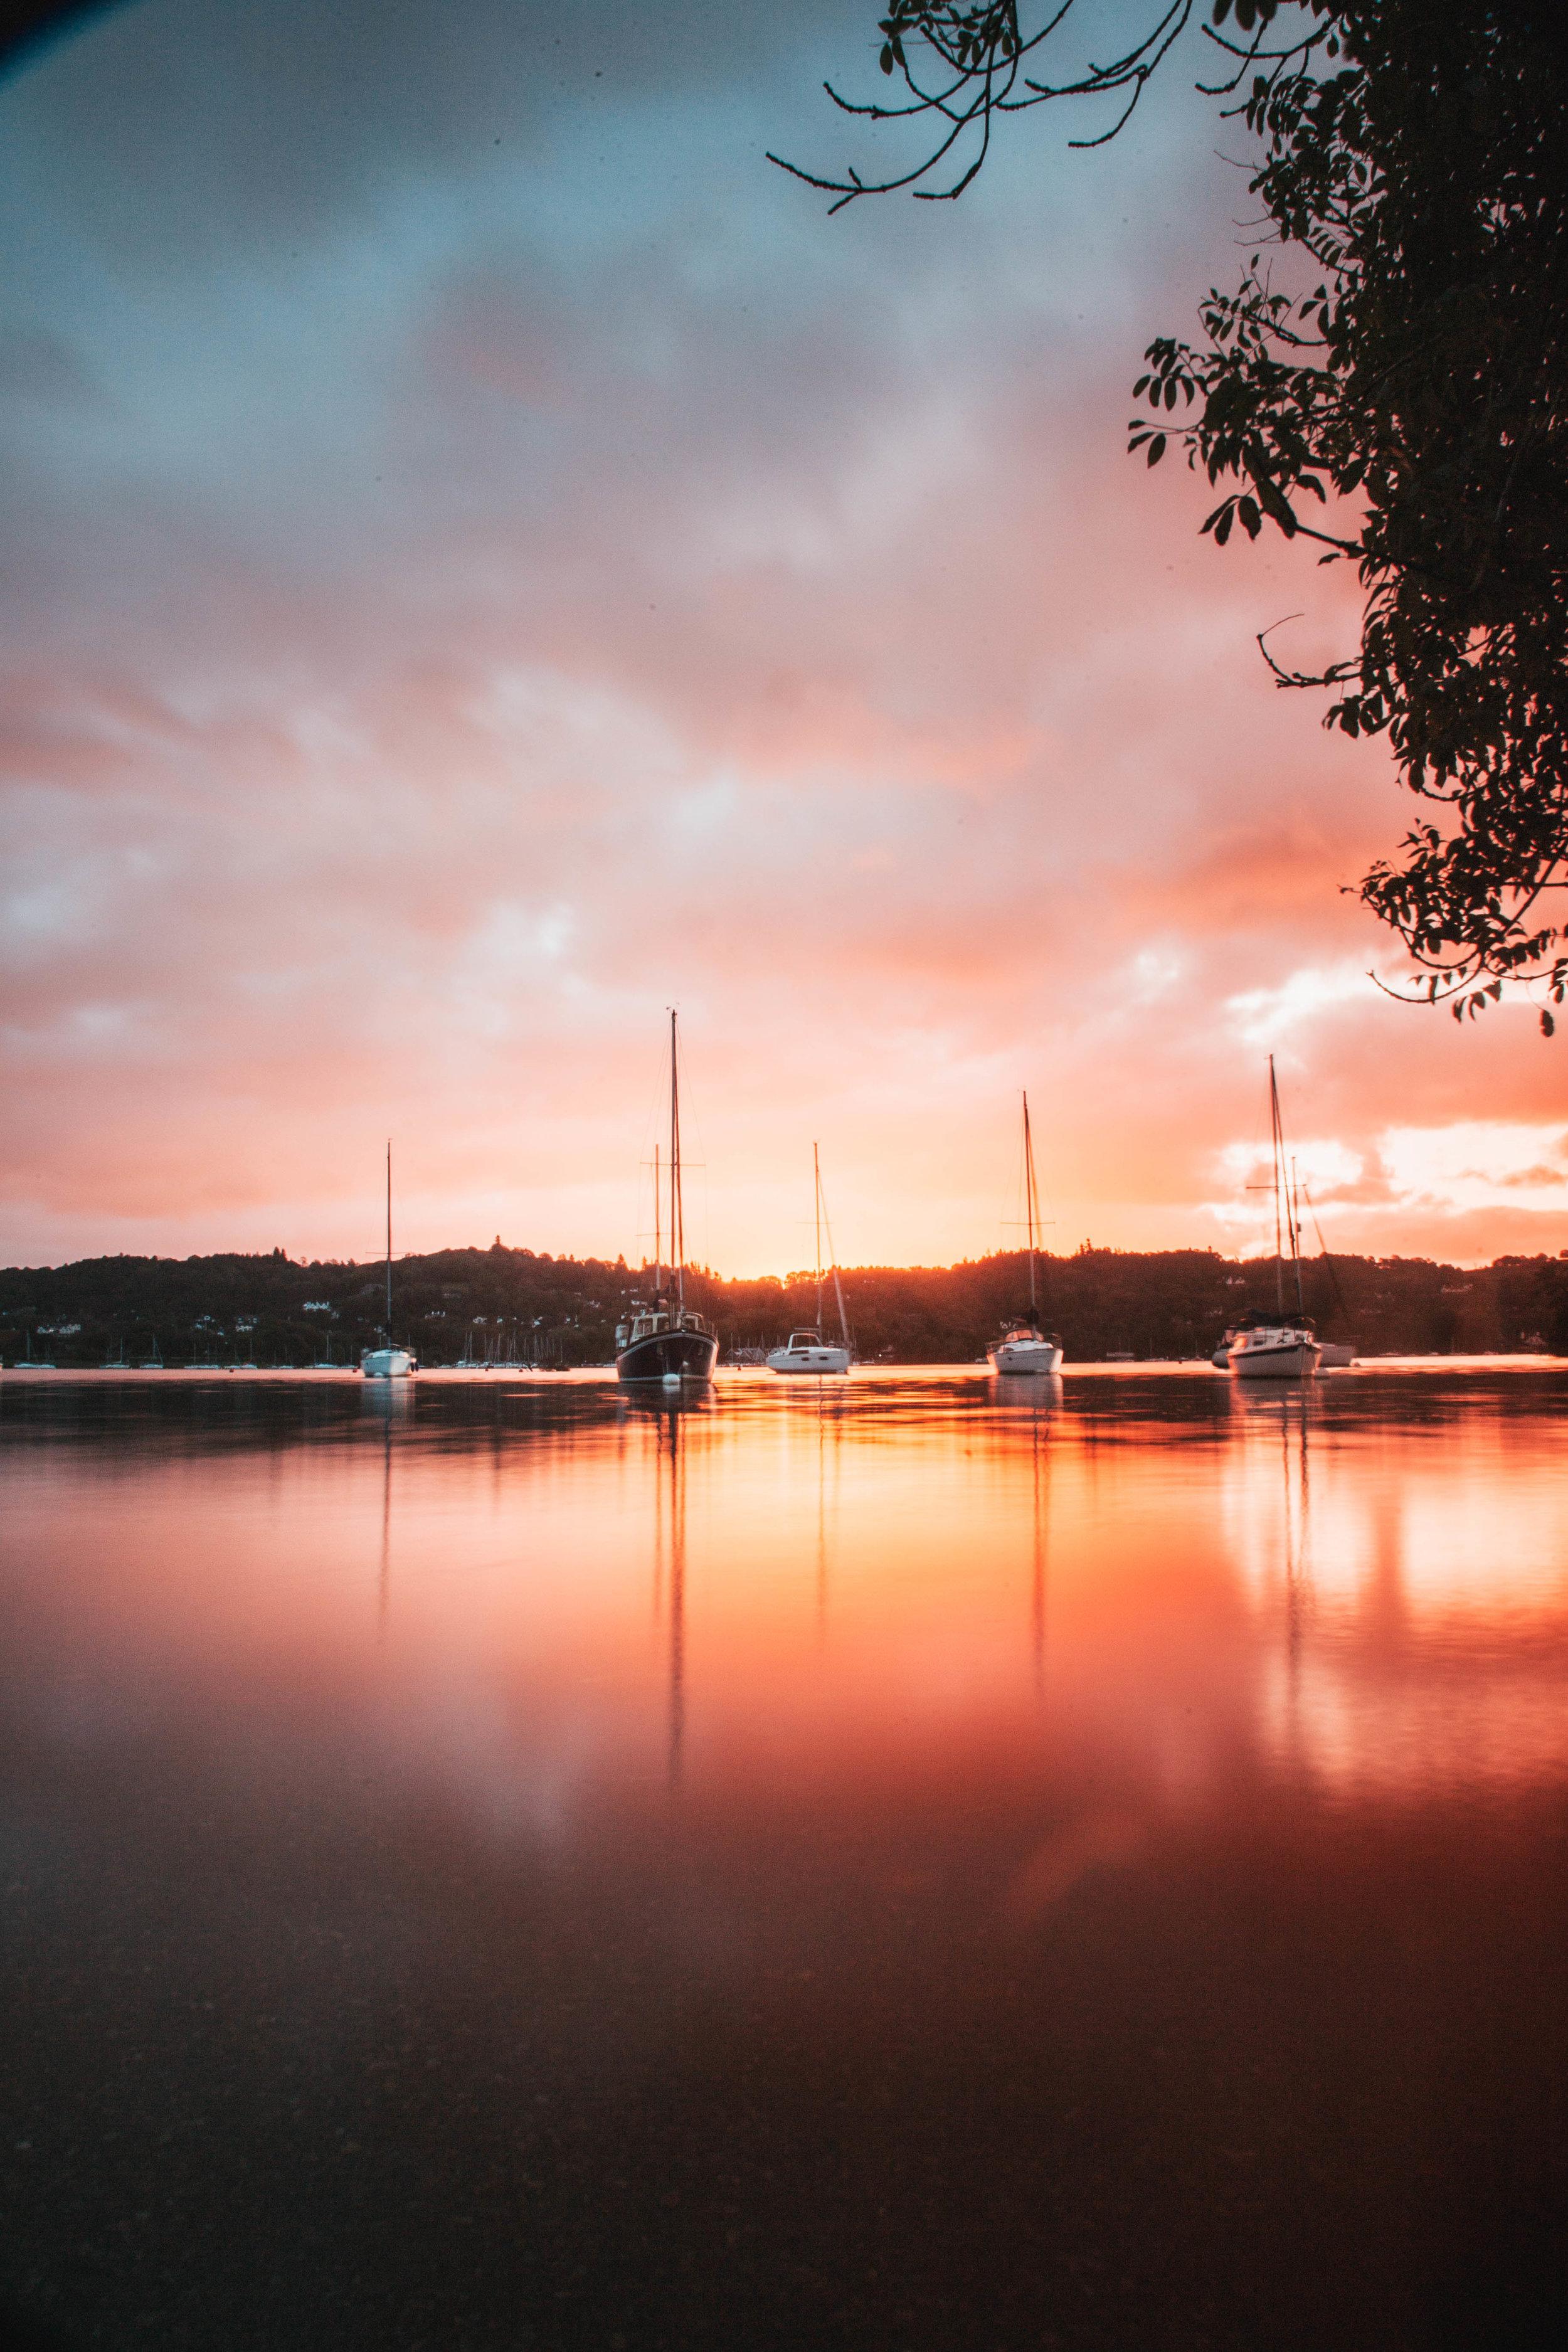 Lake-District-3.jpg